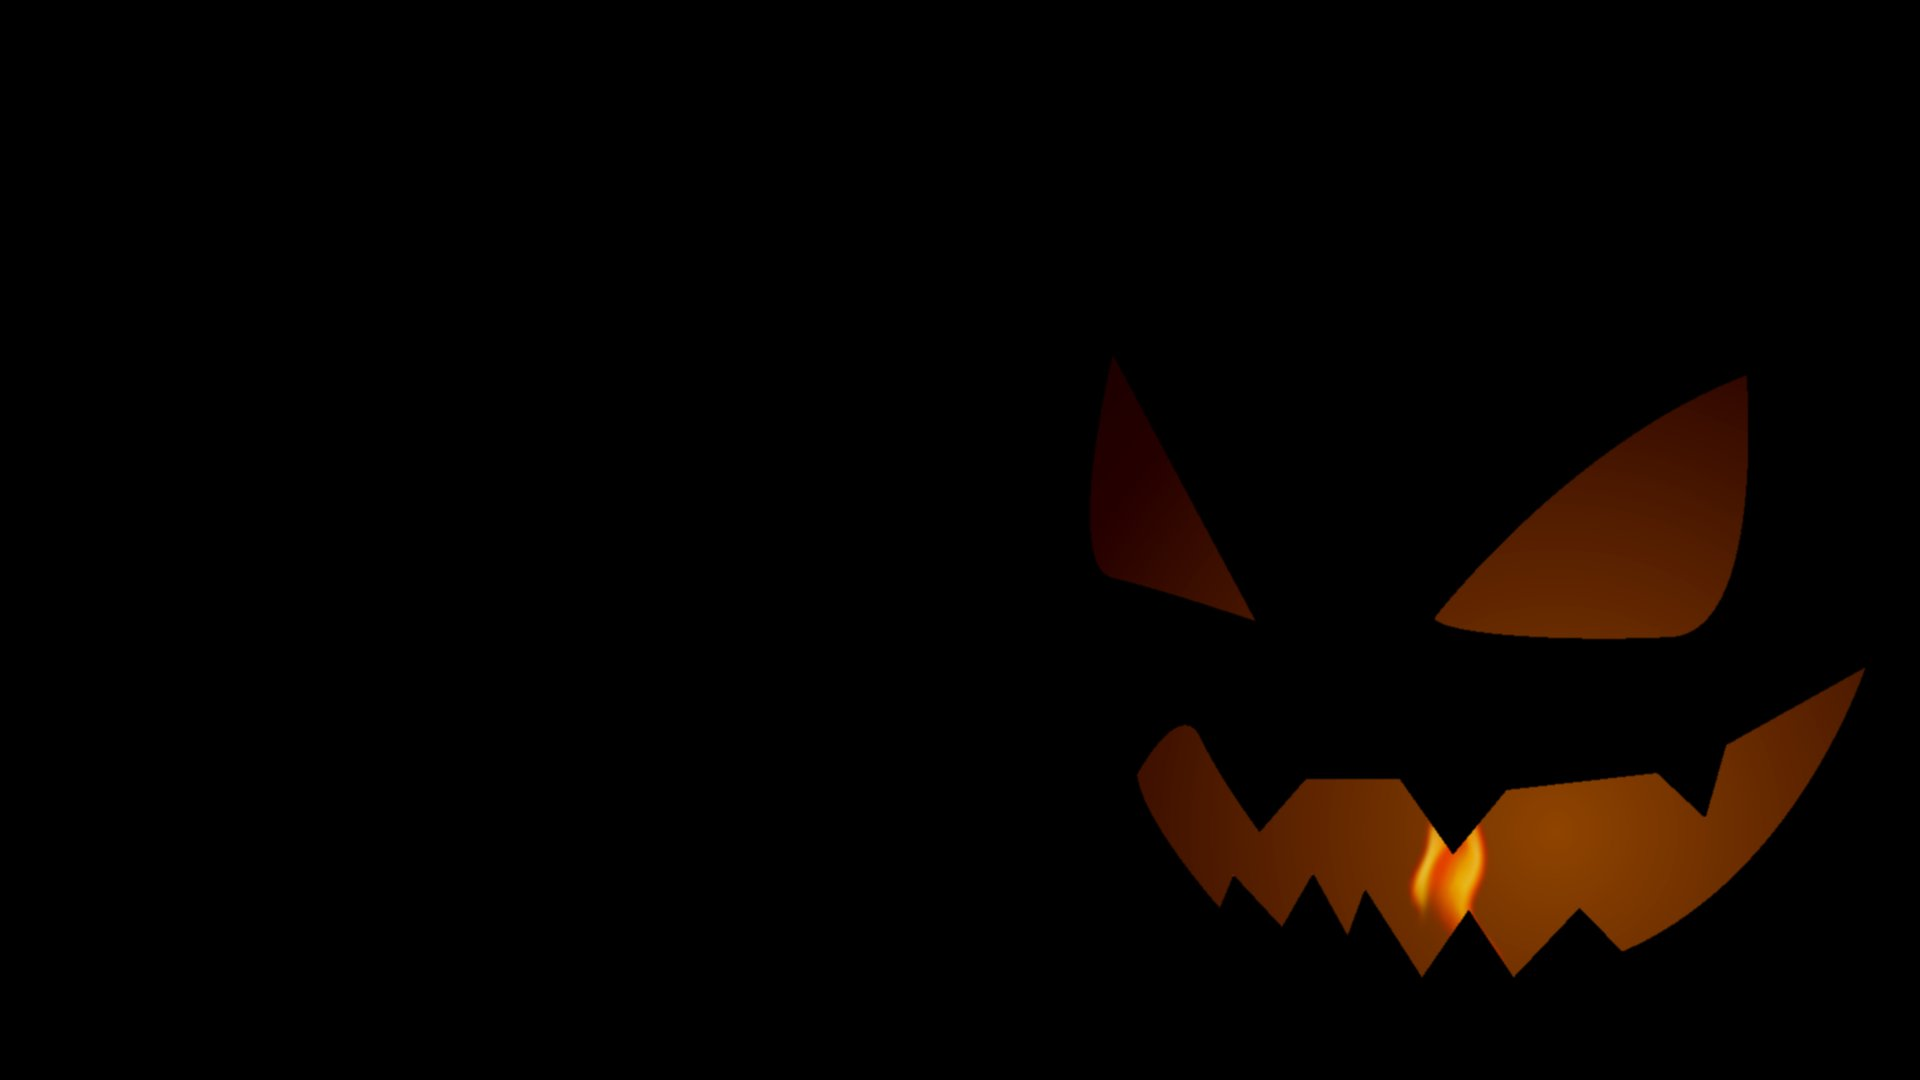 Animated Halloween Wallpaper - WallpaperSafari